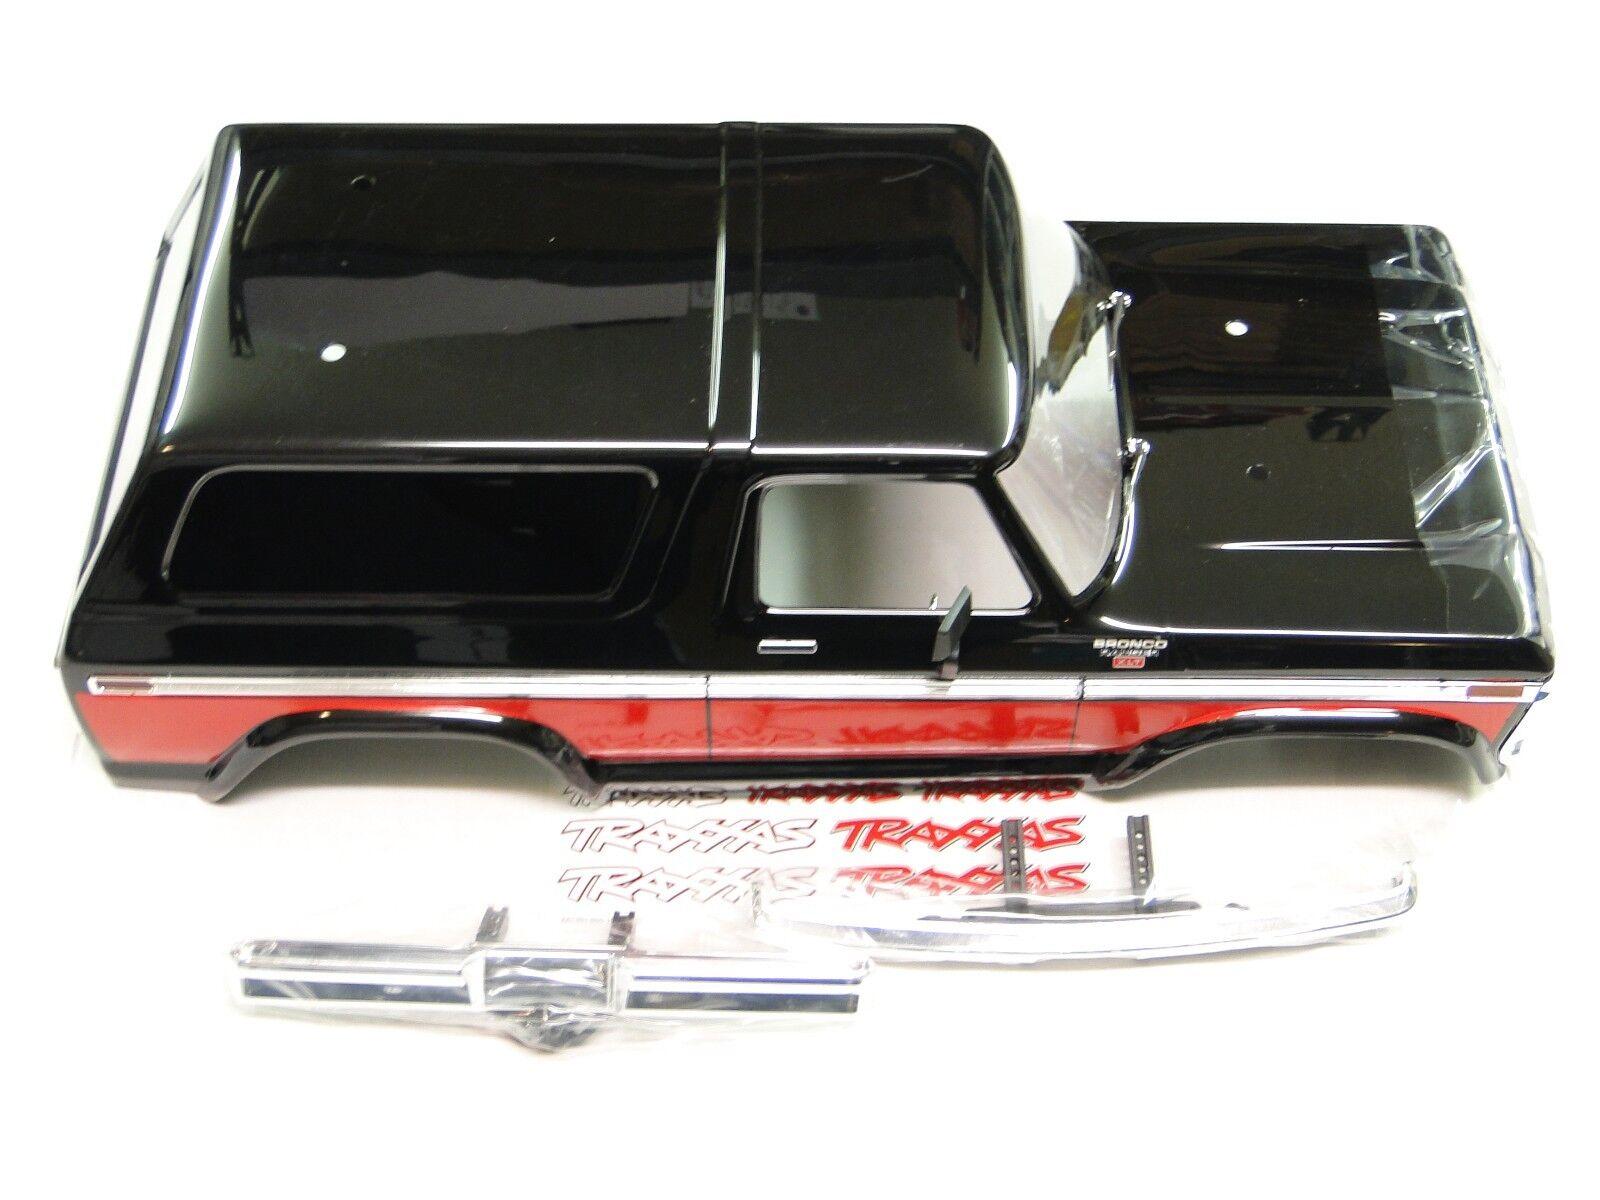 nessun minimo Nuovo TRAXXAS TRX-4    corpo BRONCO FORD RANGER XLT Painted rosso & Chrome Bumpers RV3R  tutti i beni sono speciali